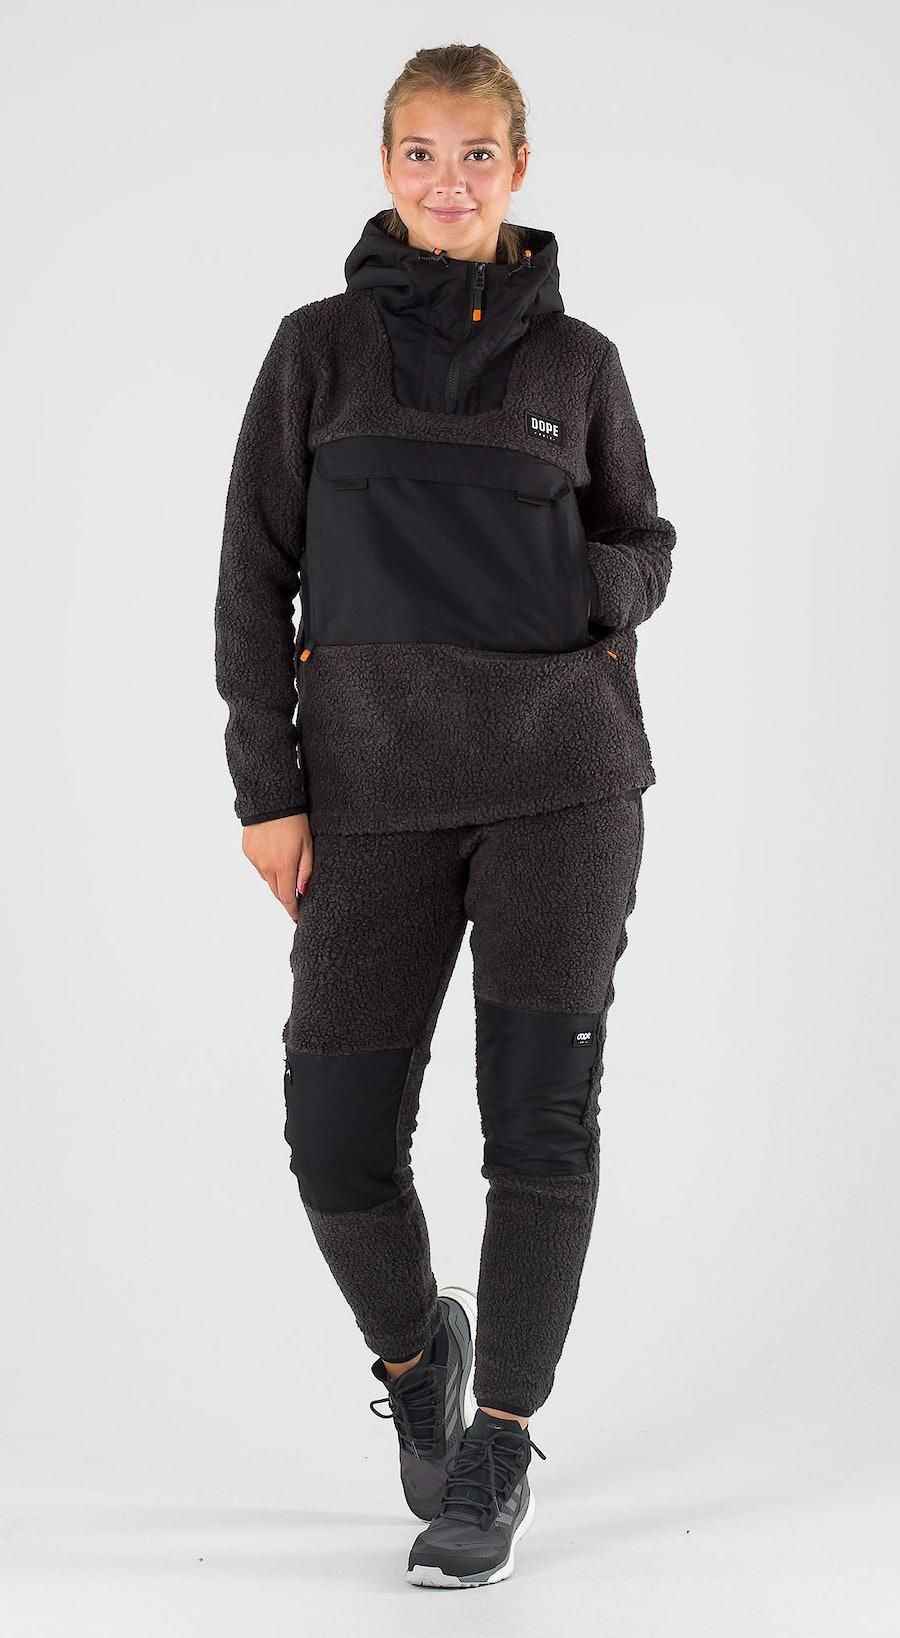 Dope Oi W Phantom/Black Outfit Multi